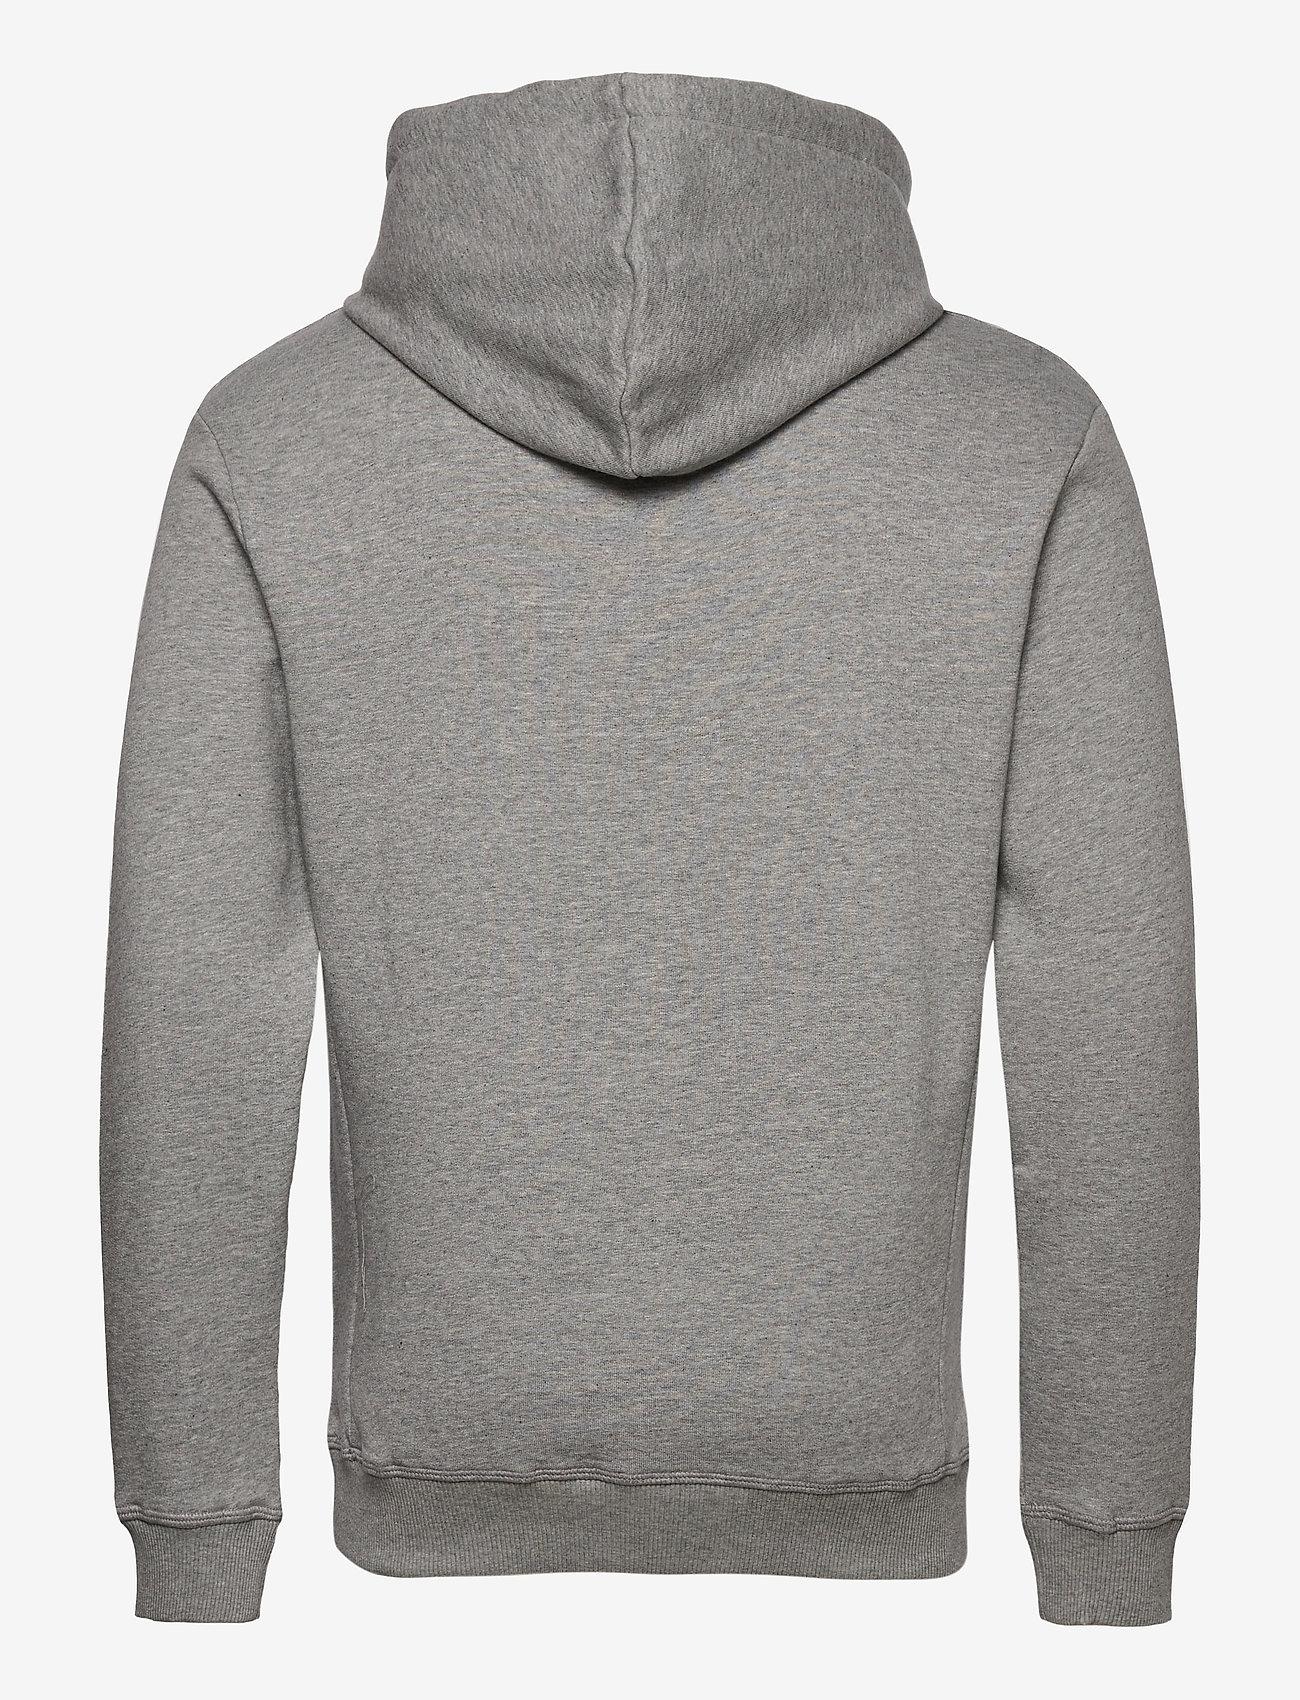 Les Deux Boozt Piece Hoodie - Sweatshirts LIGHT GREY MELANGE/CHARCOAL-BLACK - Menn Klær